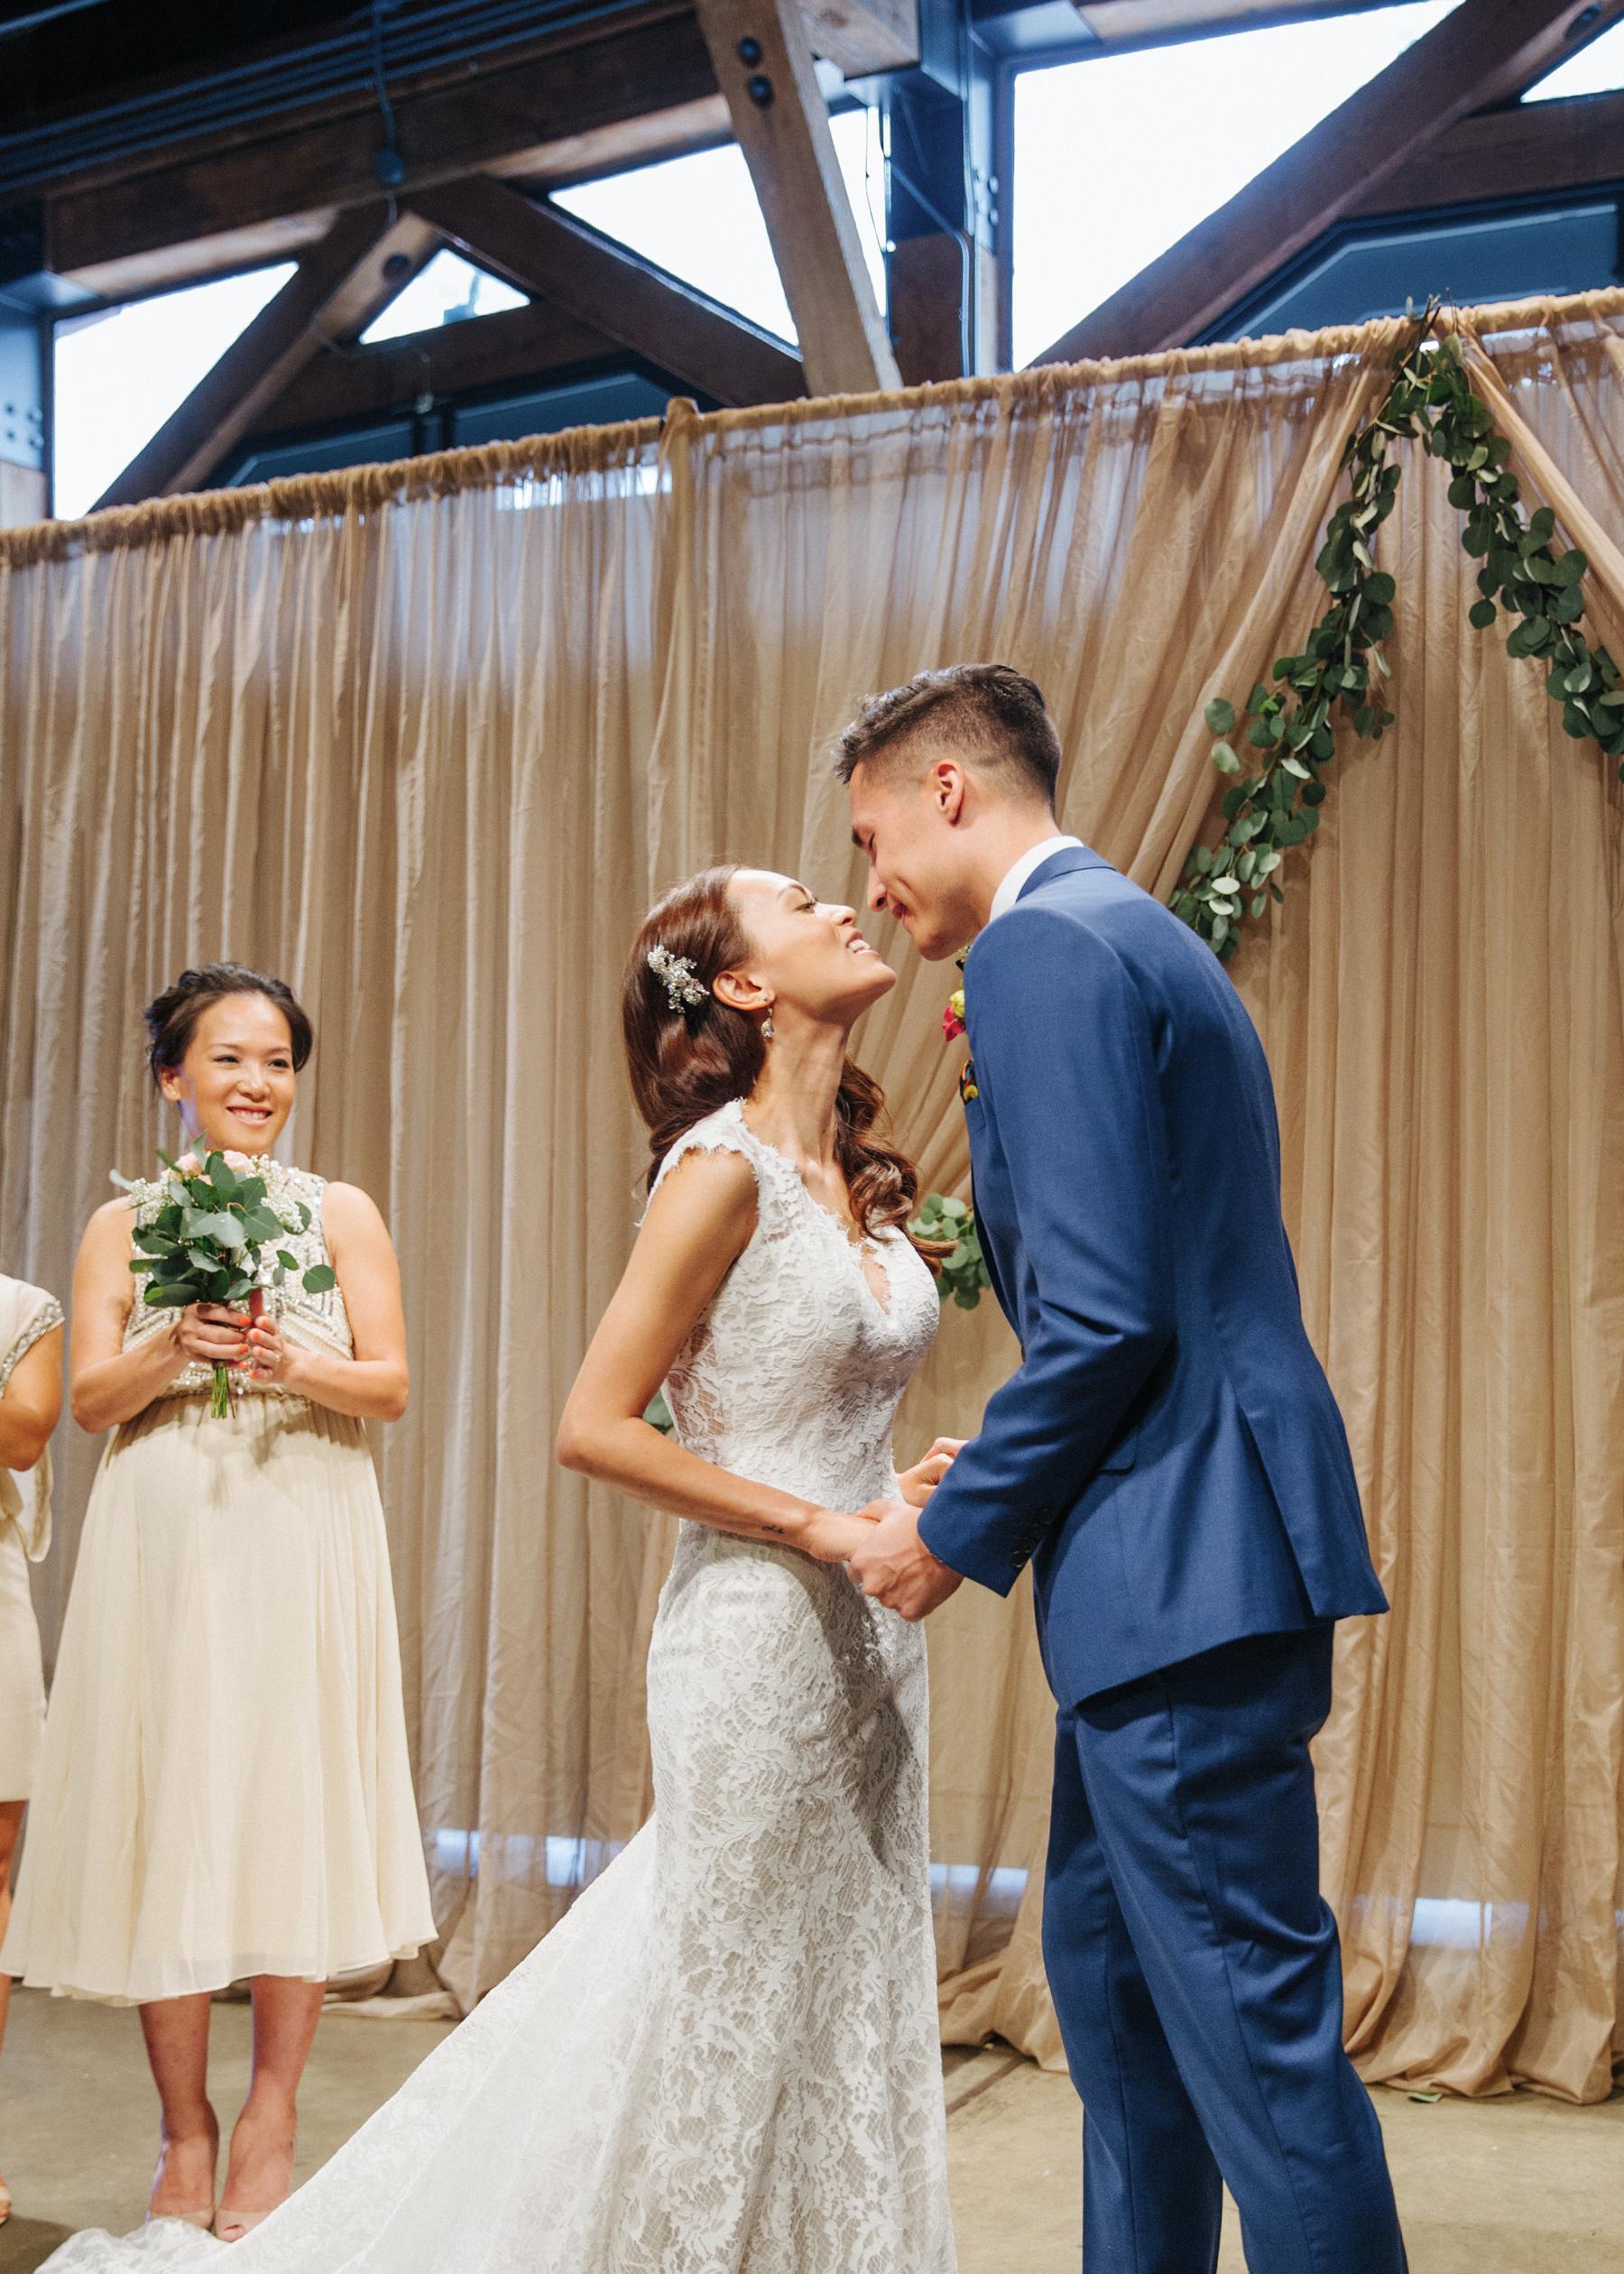 kaoverii_silva_photographer_via-herafilms_kieu_kaz_wedding-13.jpg